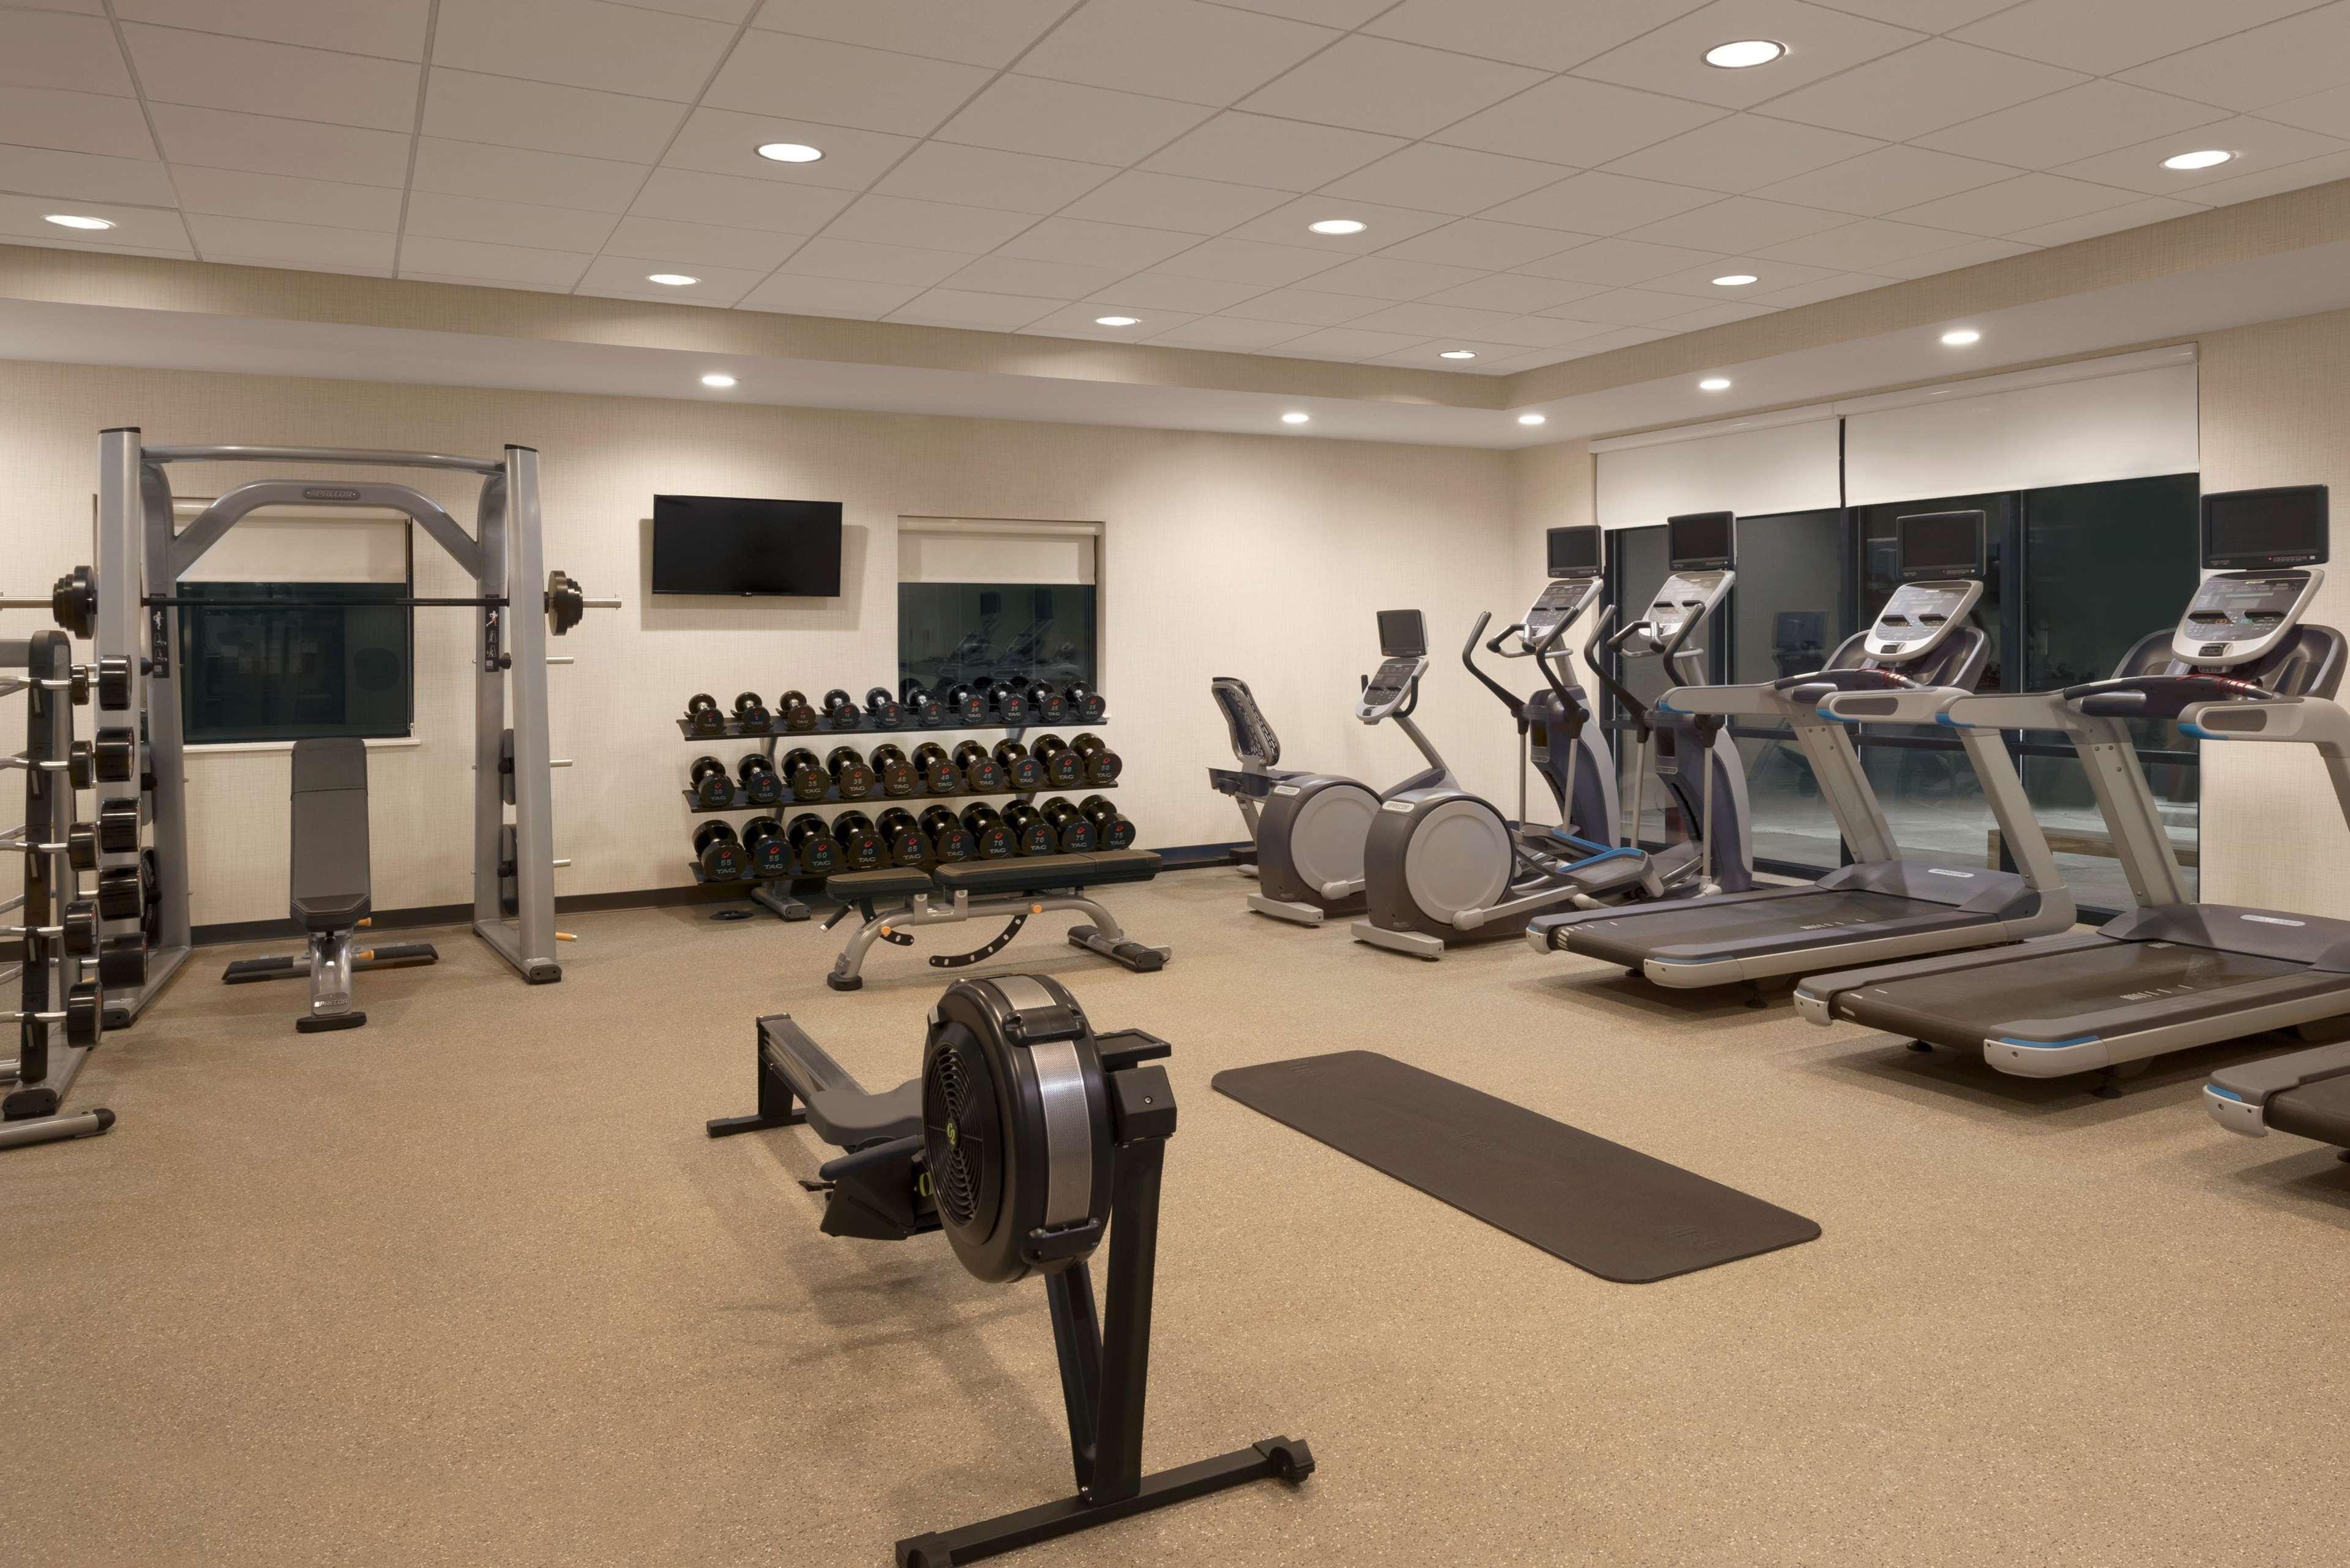 Home2 Suites by Hilton Leavenworth Downtown image 12